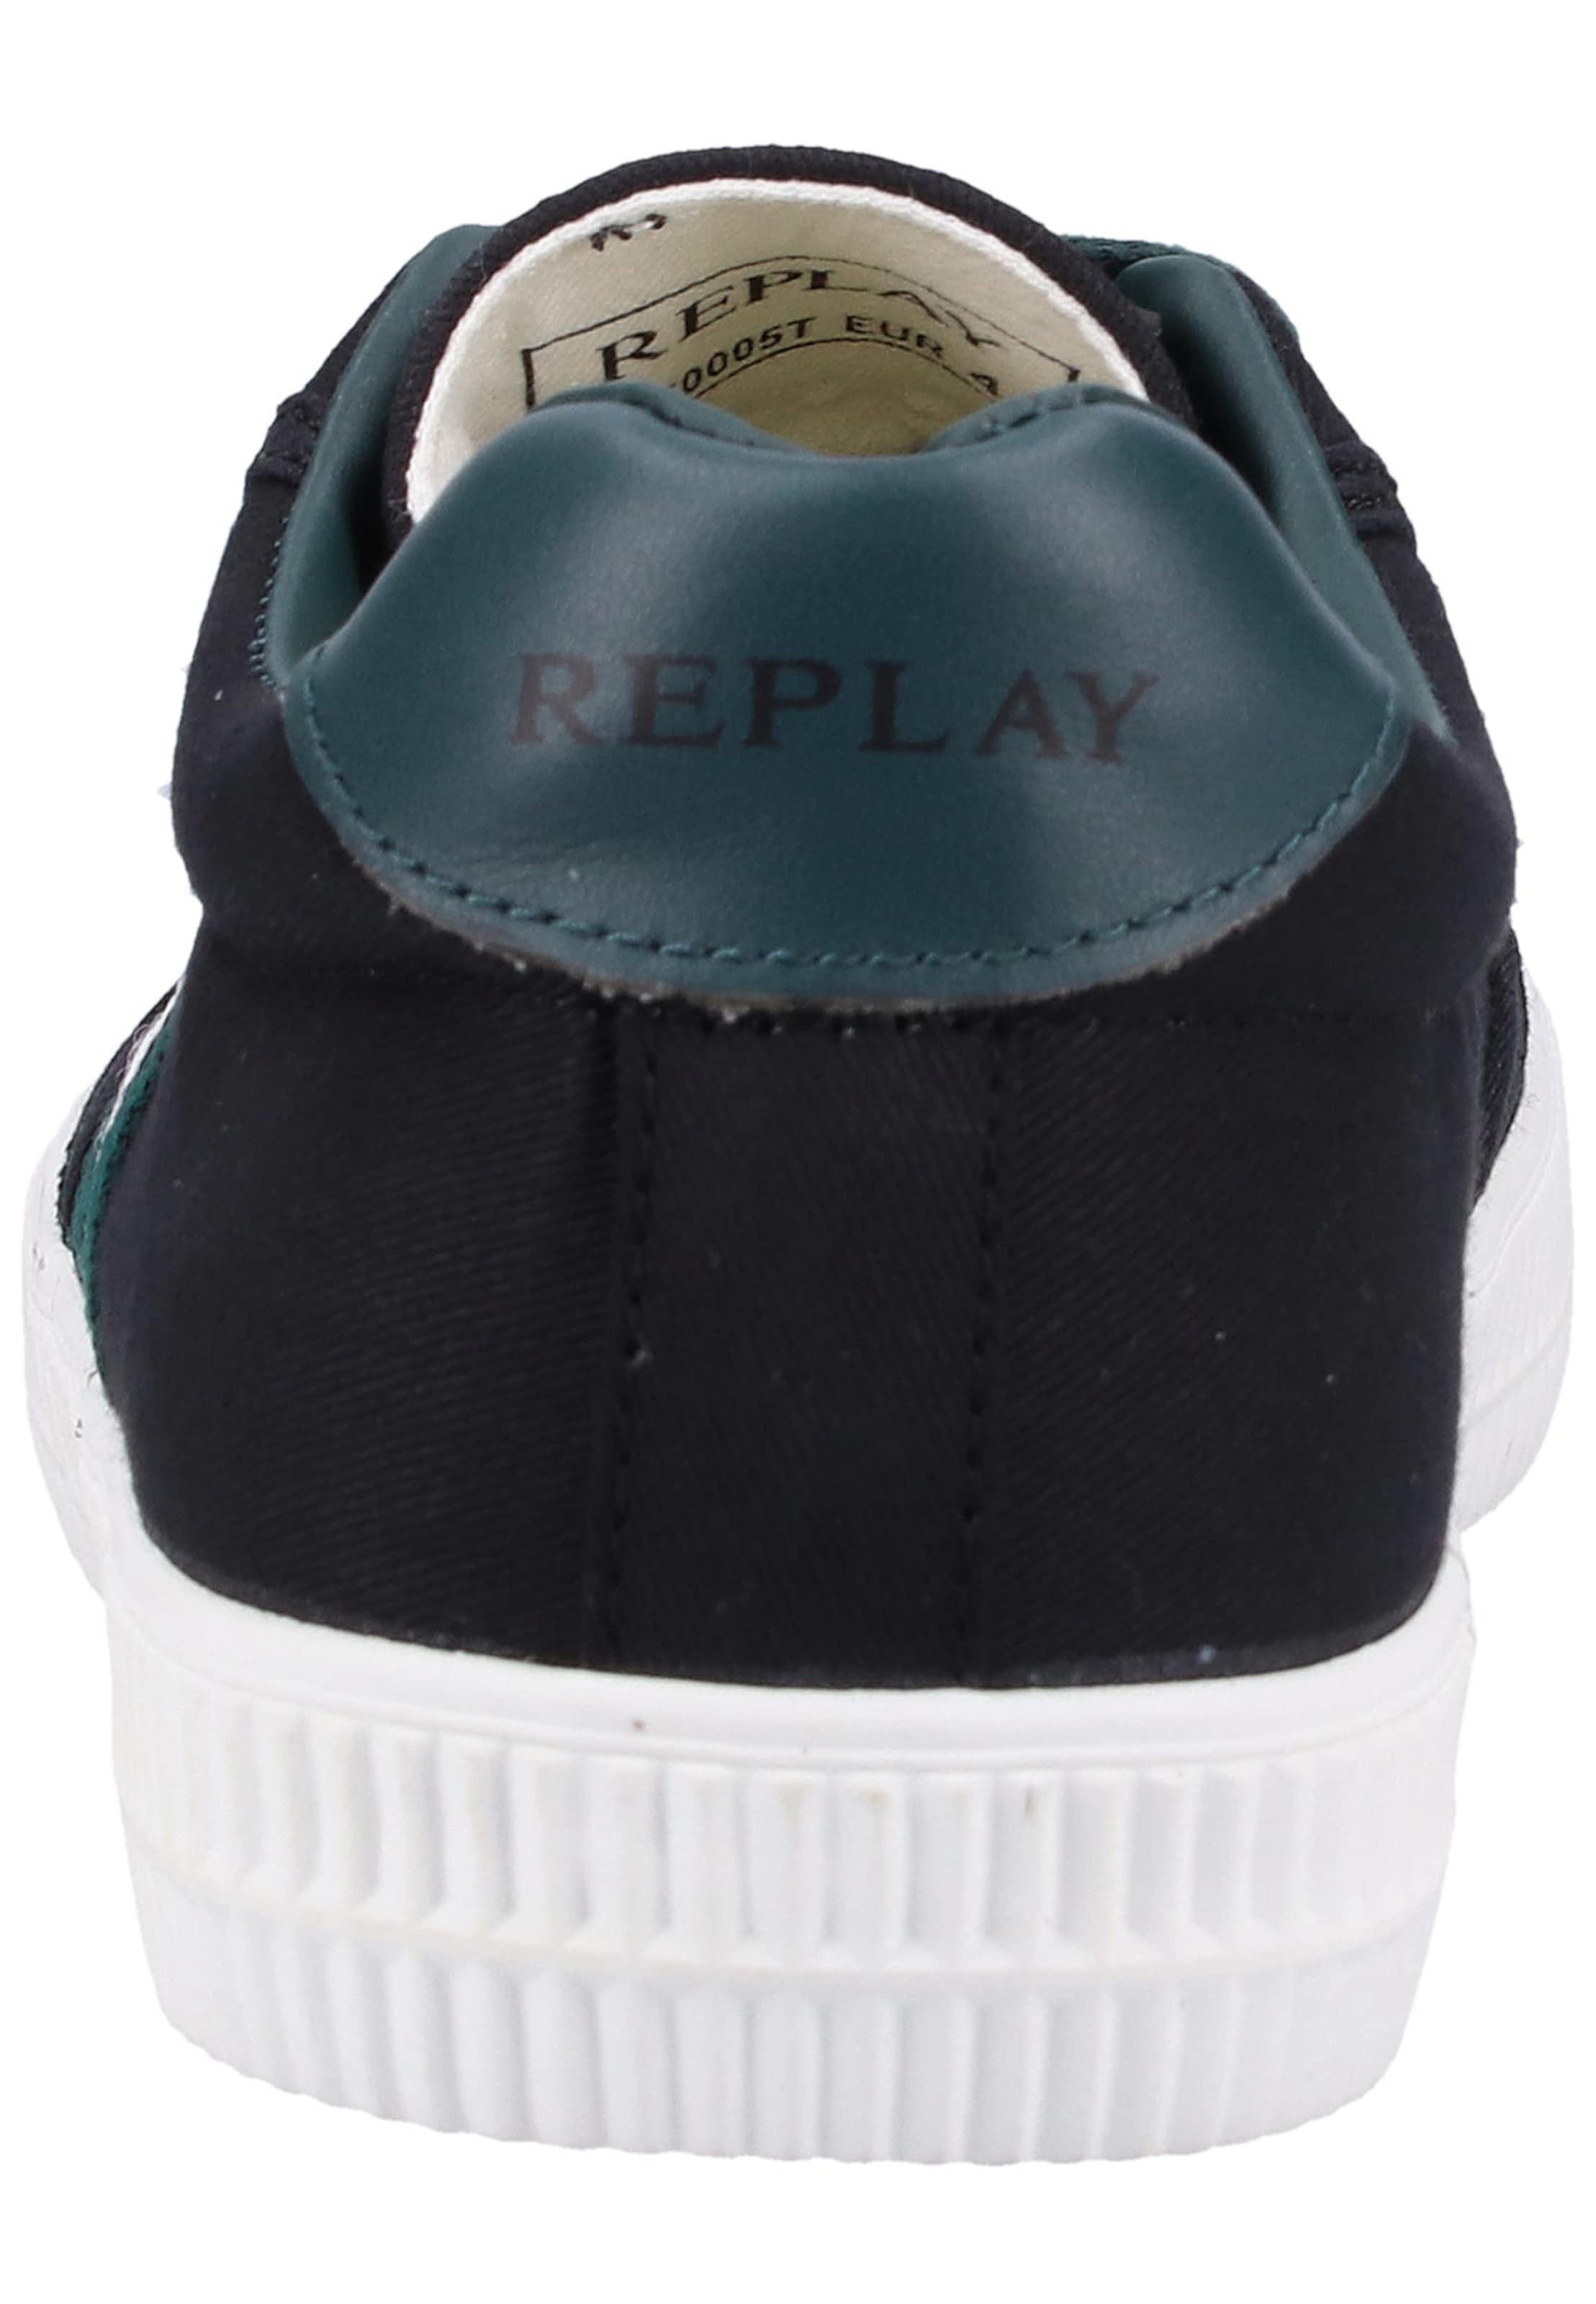 In DunkelgrünSchwarz In In DunkelgrünSchwarz Replay Replay Sneaker In Replay Sneaker Sneaker DunkelgrünSchwarz Sneaker Replay XTkuwOPZi